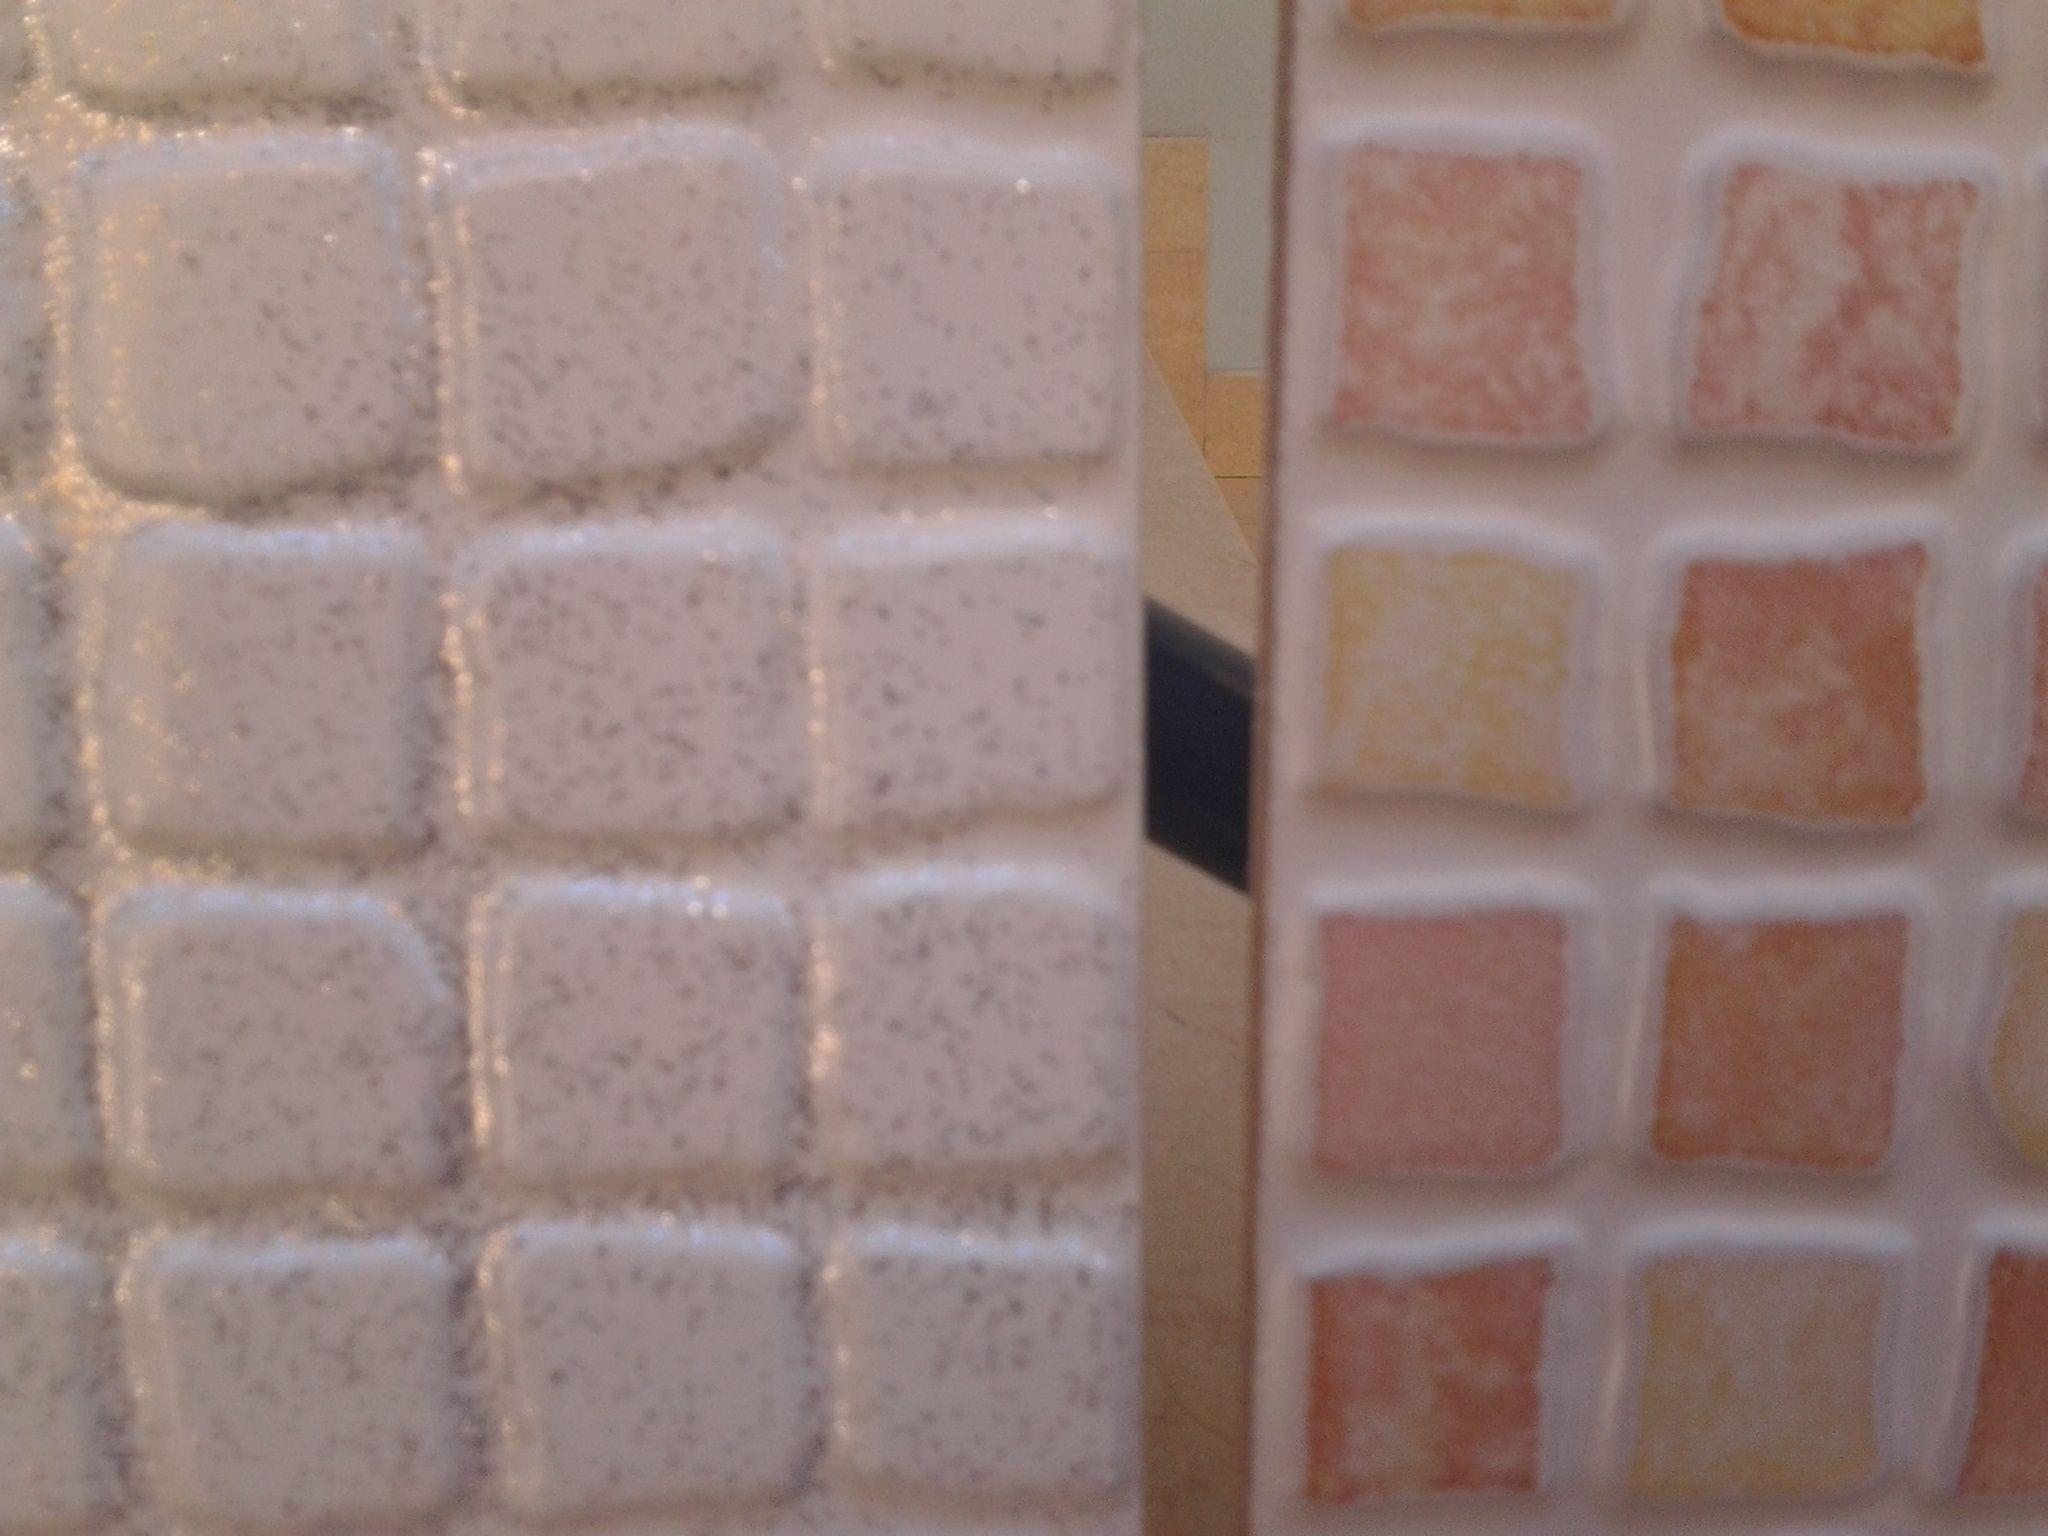 Pittura epossidica dipingere piastrelle lavandini legno